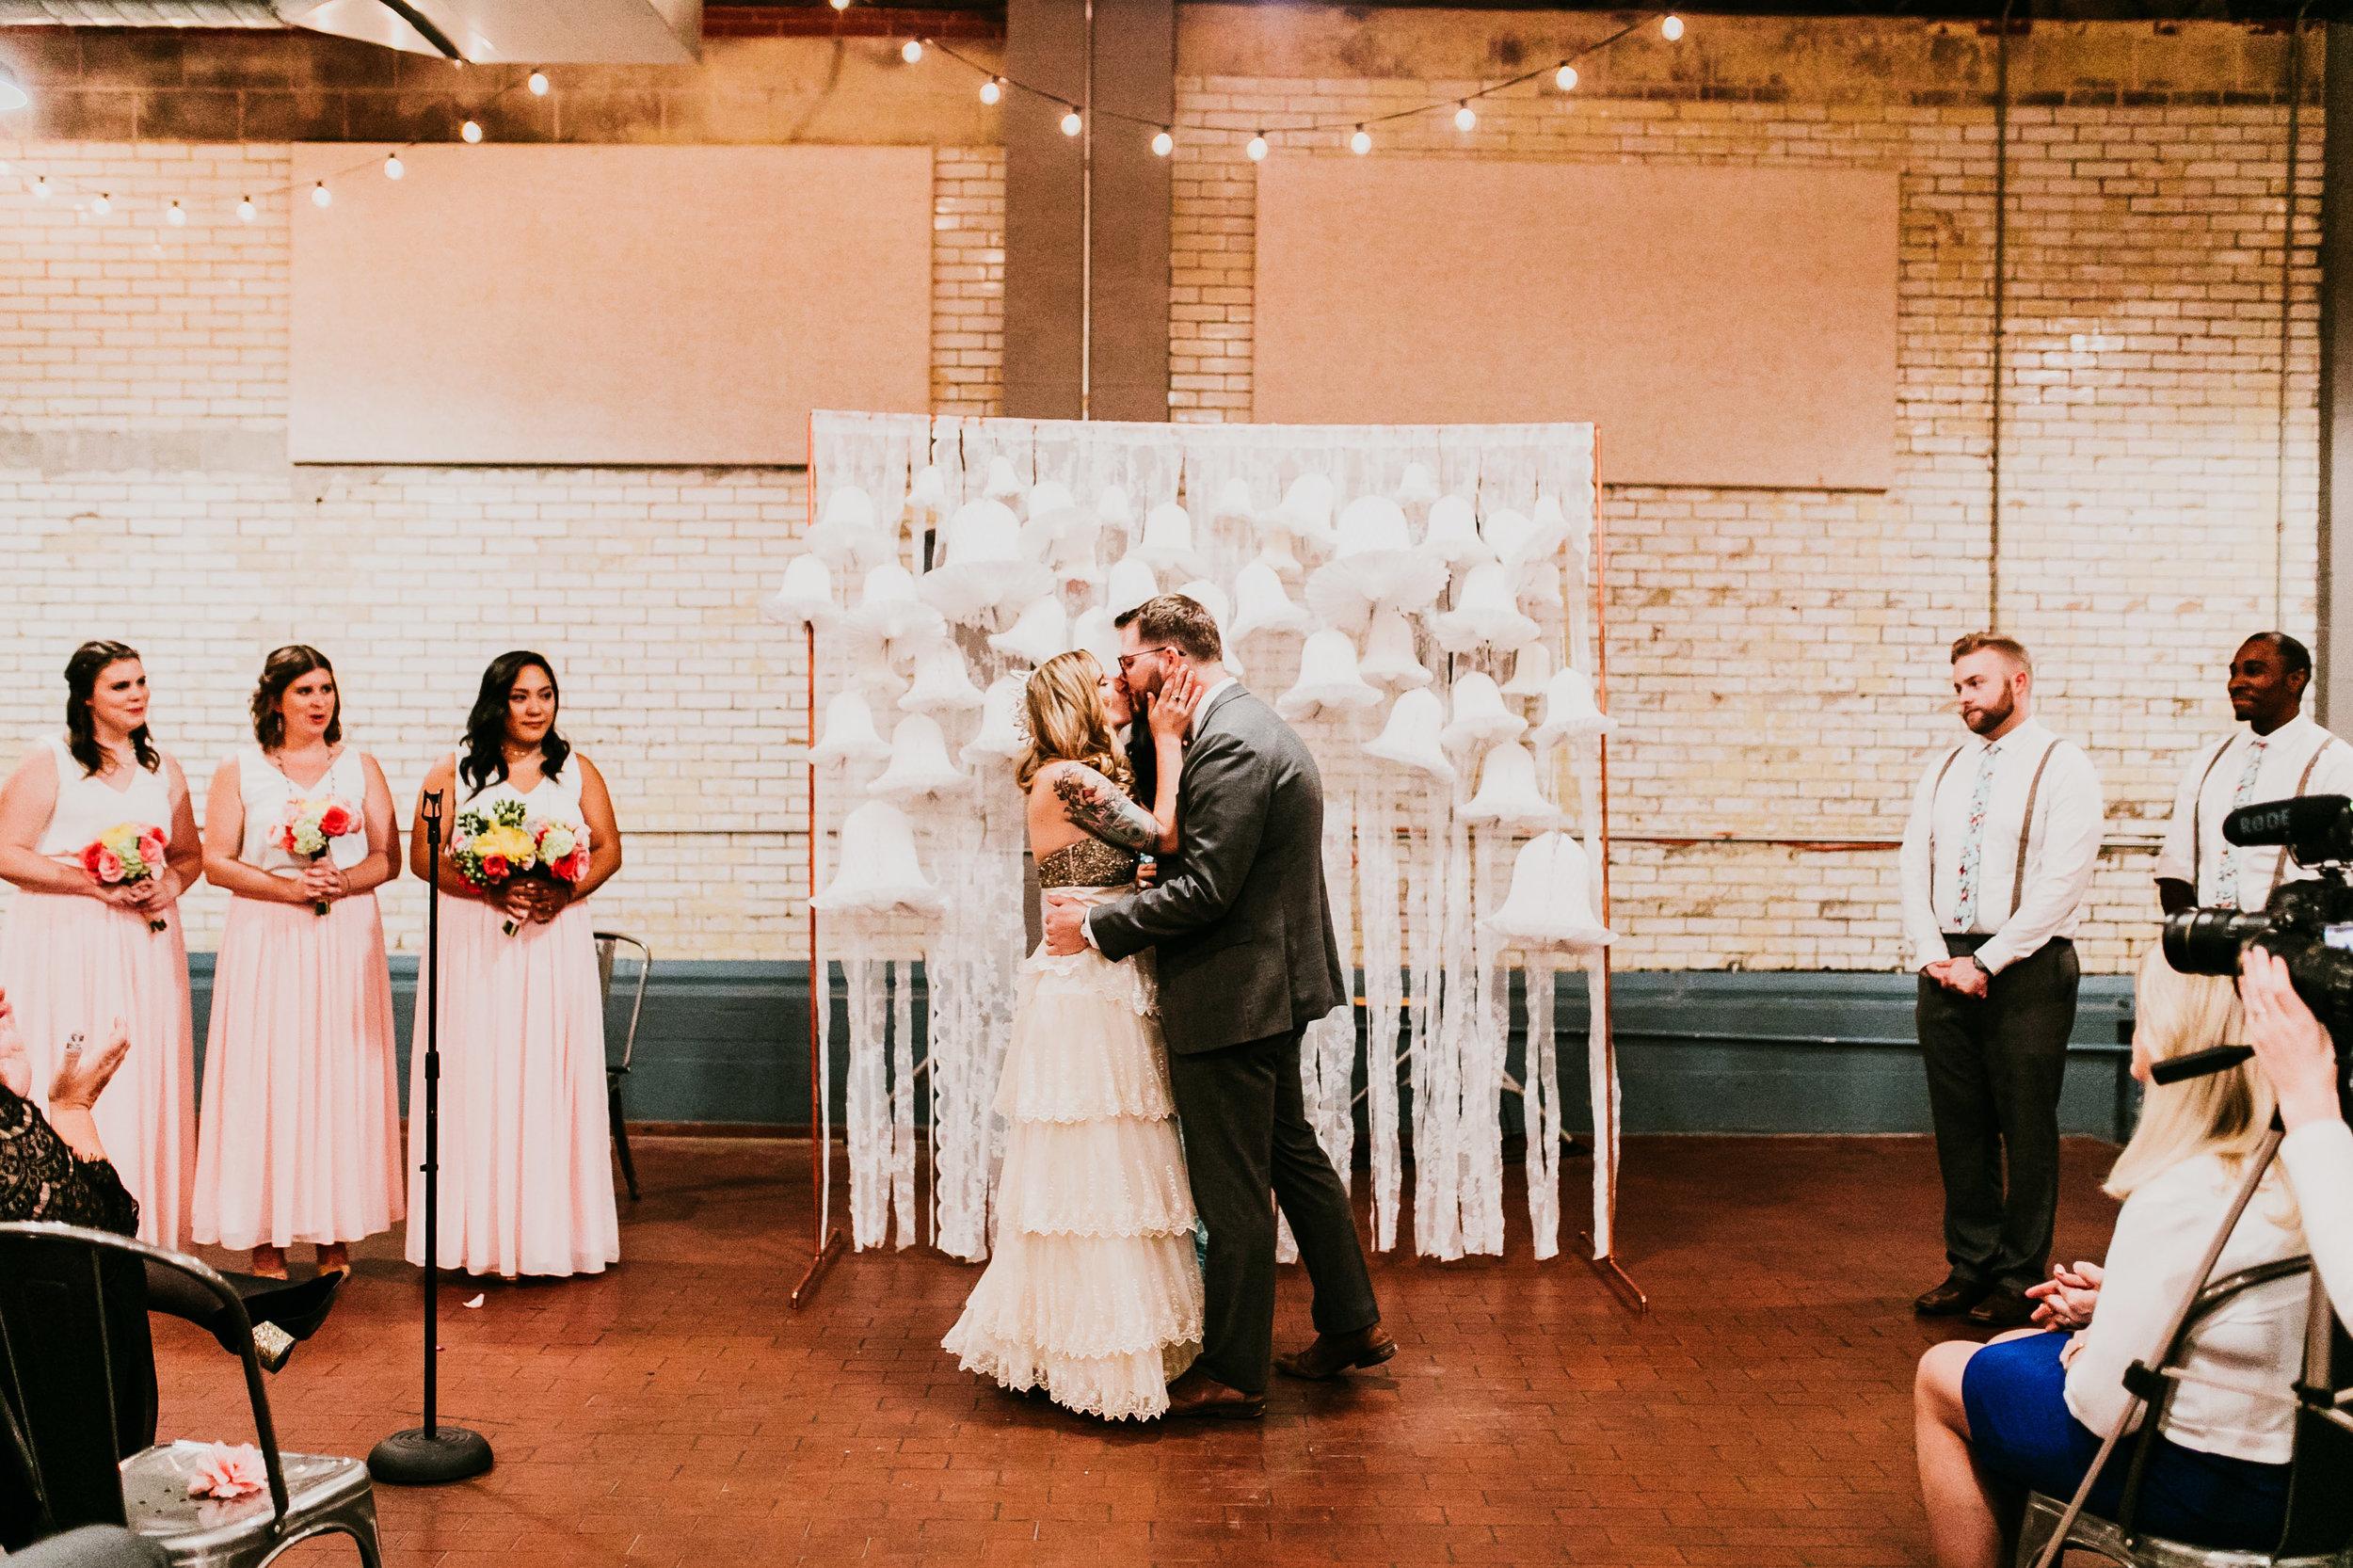 uprooted-traveler-traditional-vs-vegas-wedding-altar-pronounce.jpg